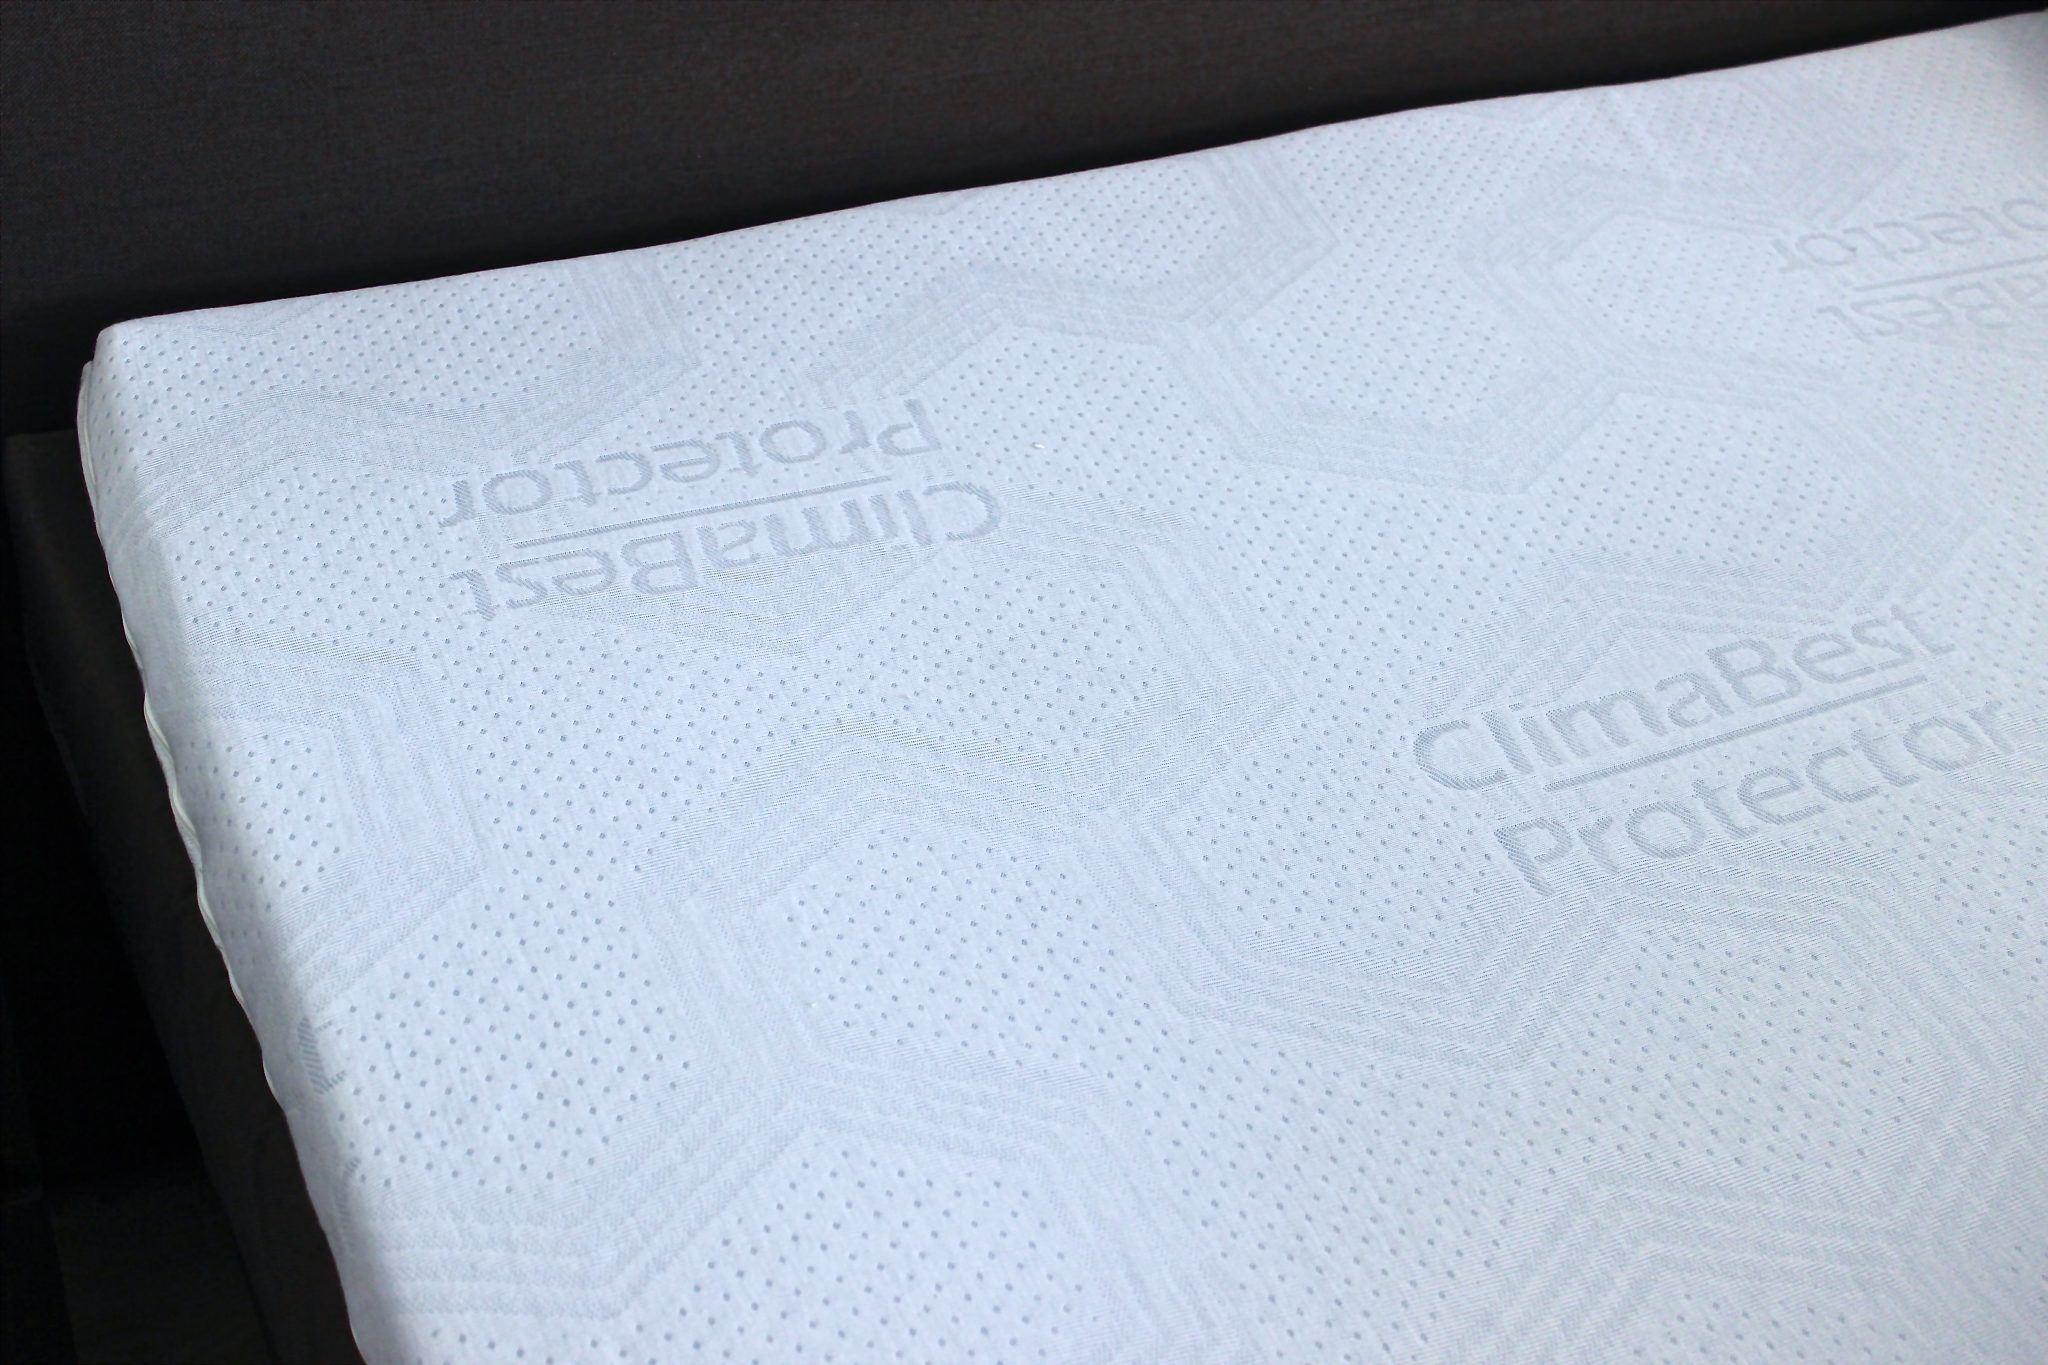 Climabest koudschuim matrastopper